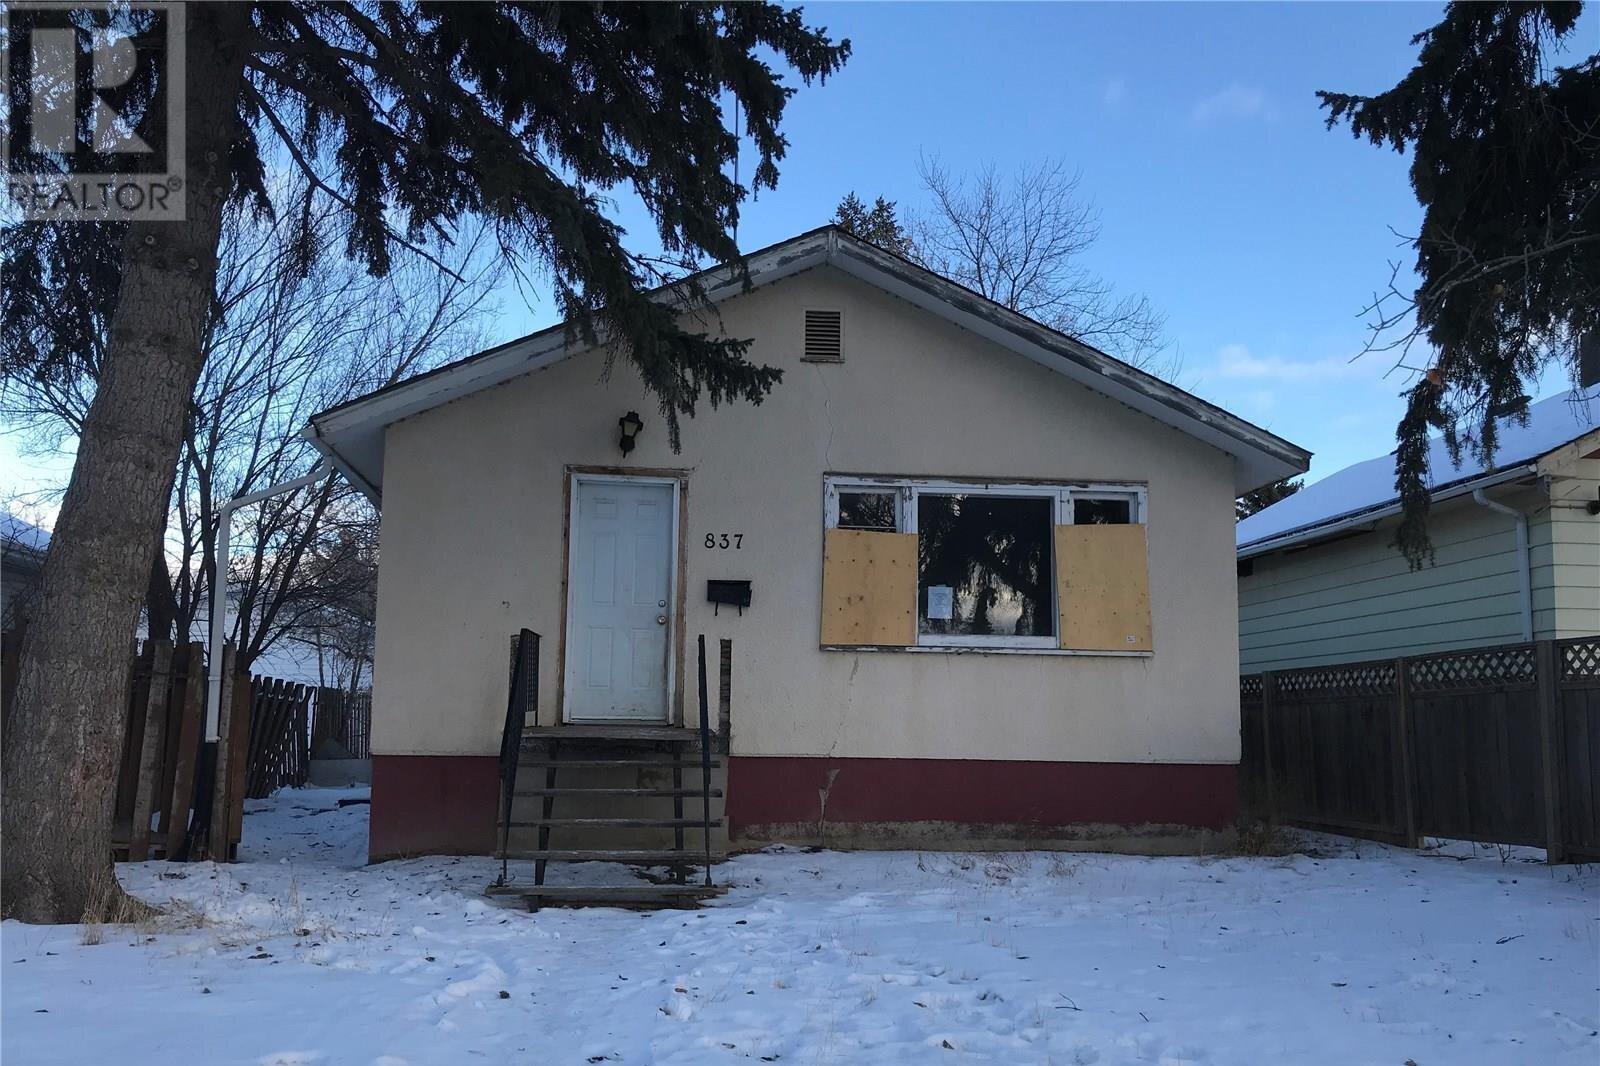 House for sale at 837 Mctavish St Regina Saskatchewan - MLS: SK834880